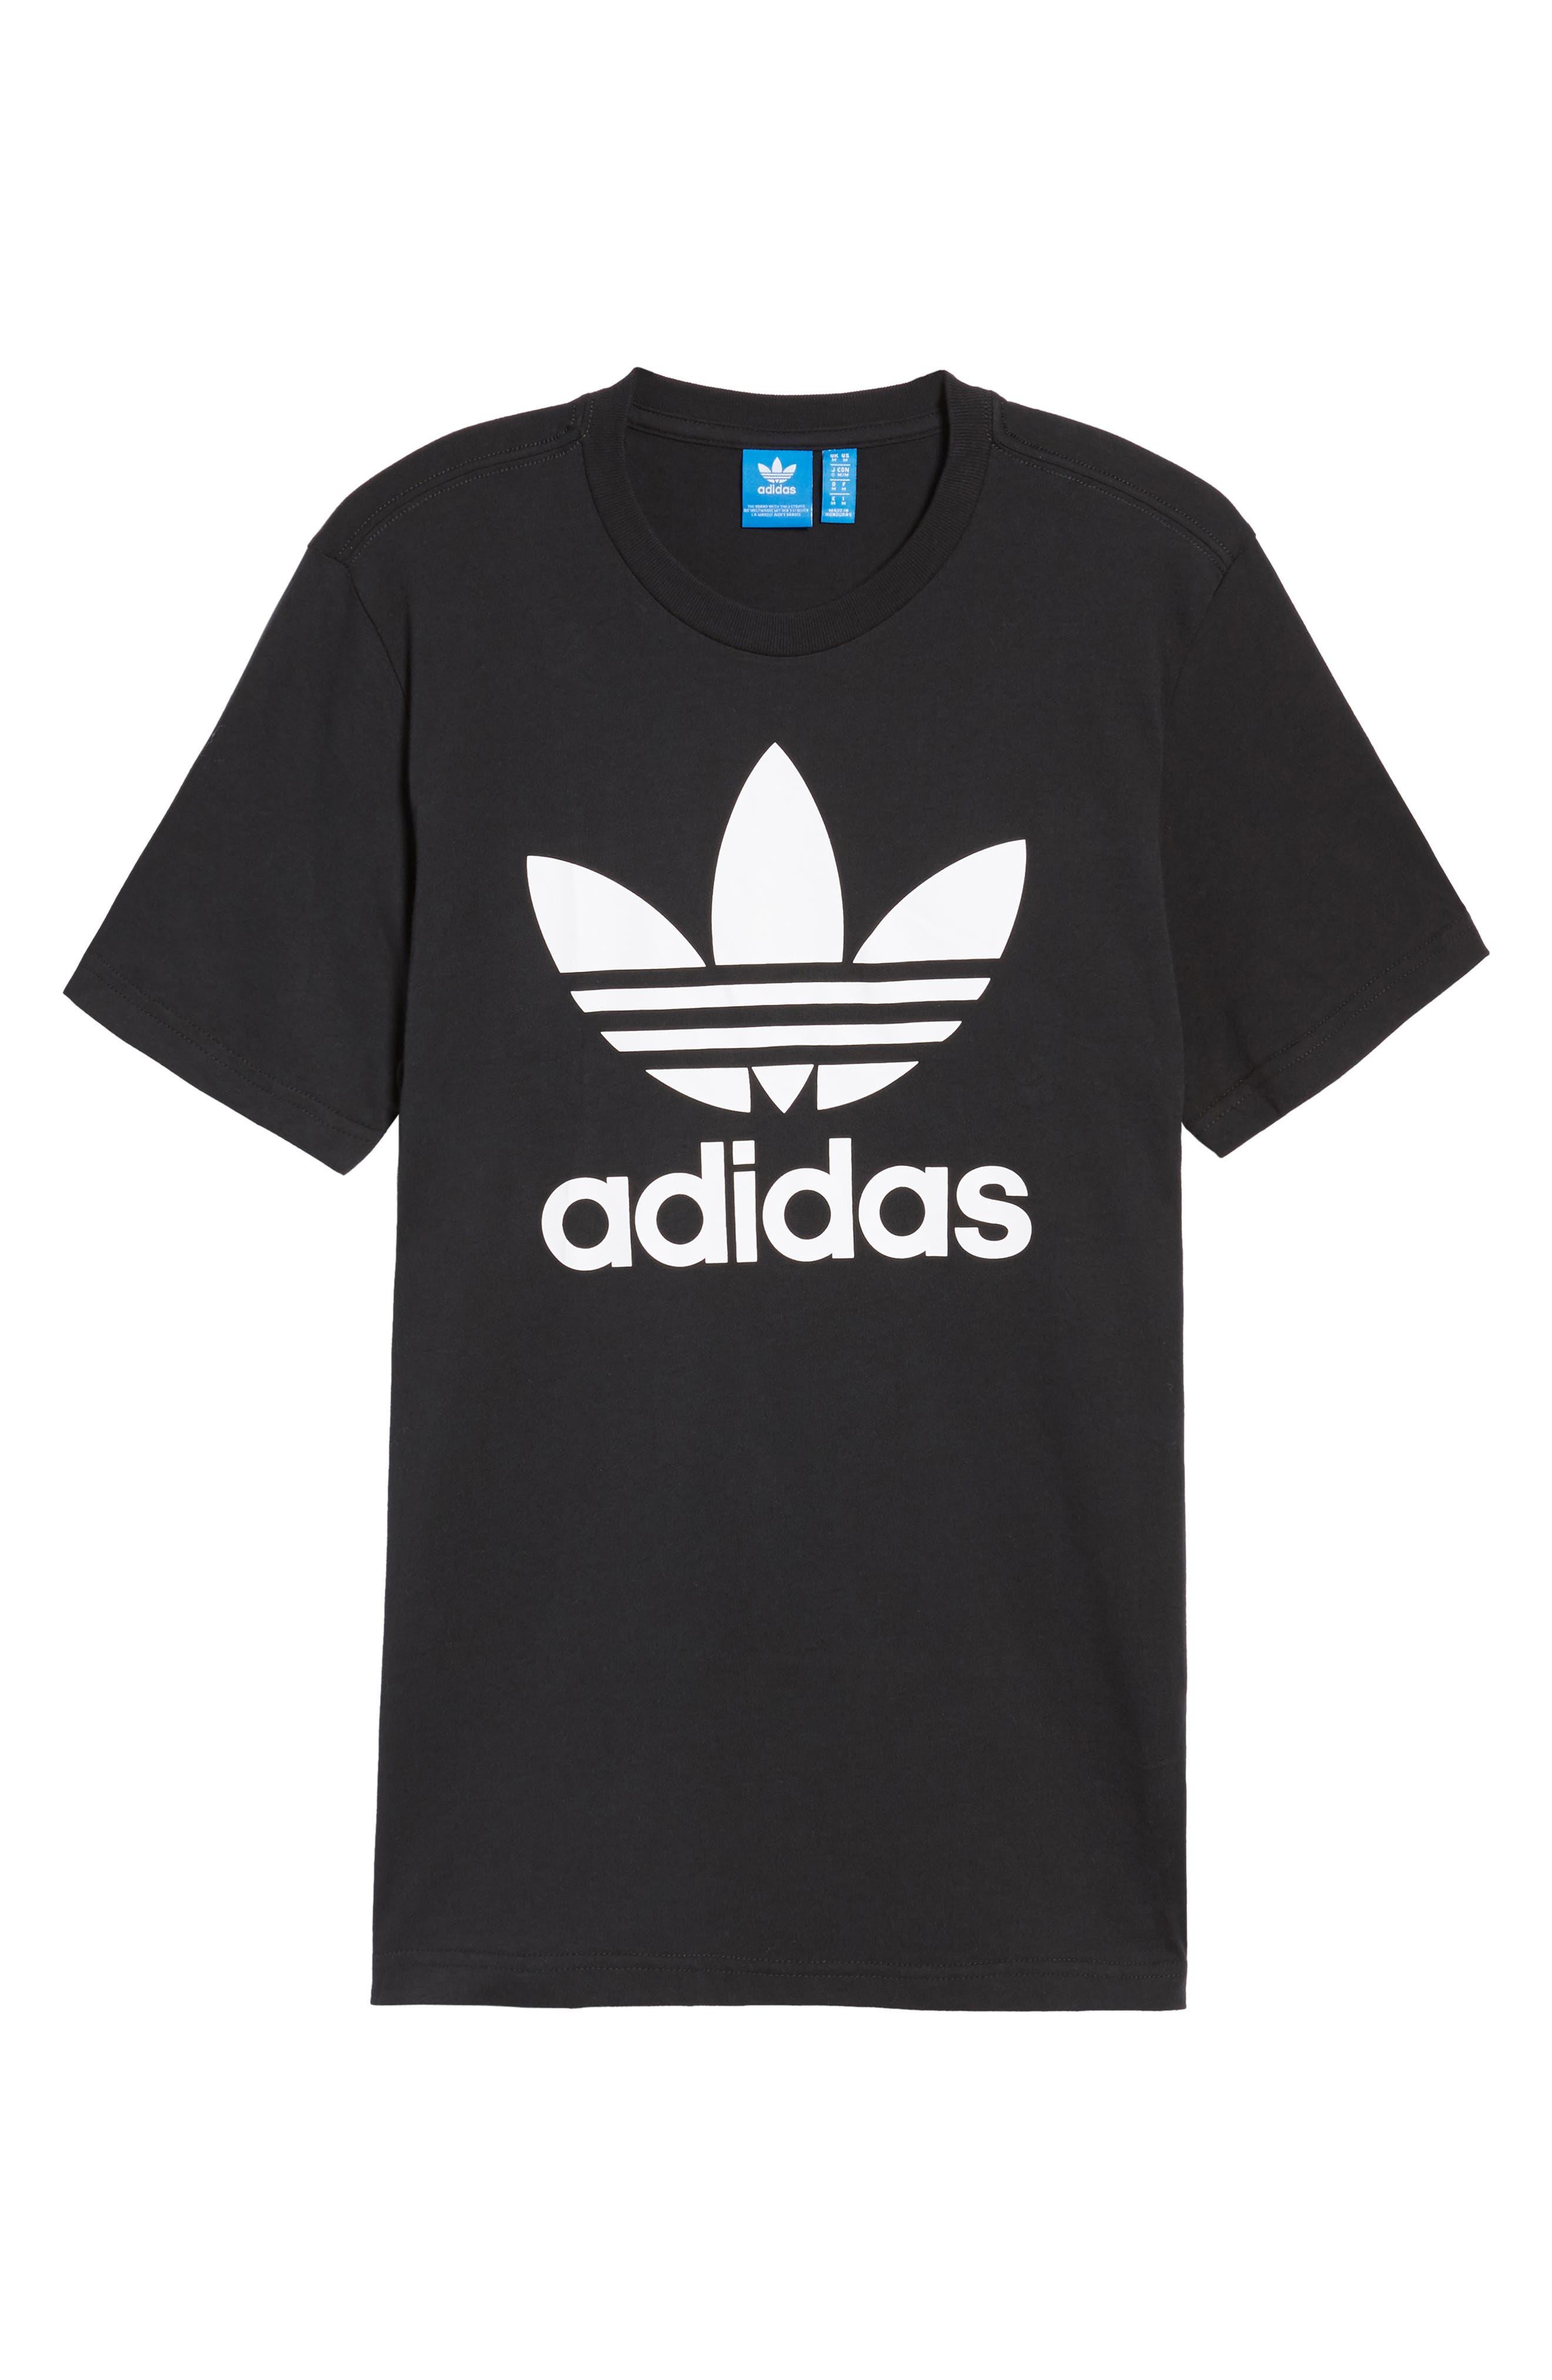 adidas Originals Trefoil Graphic T-Shirt